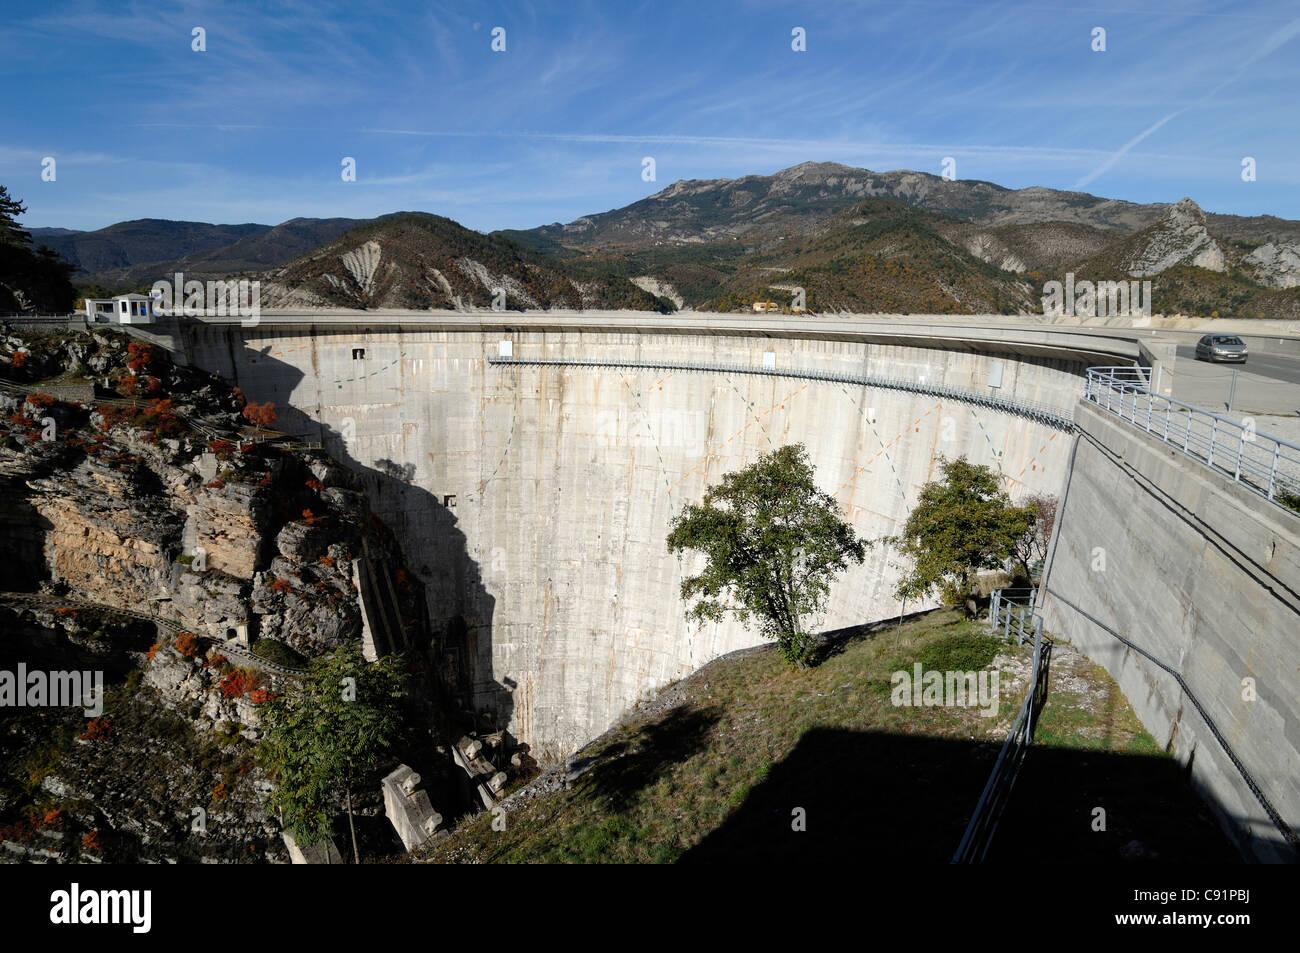 Castillon Dam or Barrage & Hydro-Electric Power Station, Demandolx, near Castellane, in southern French Alps - Stock Image